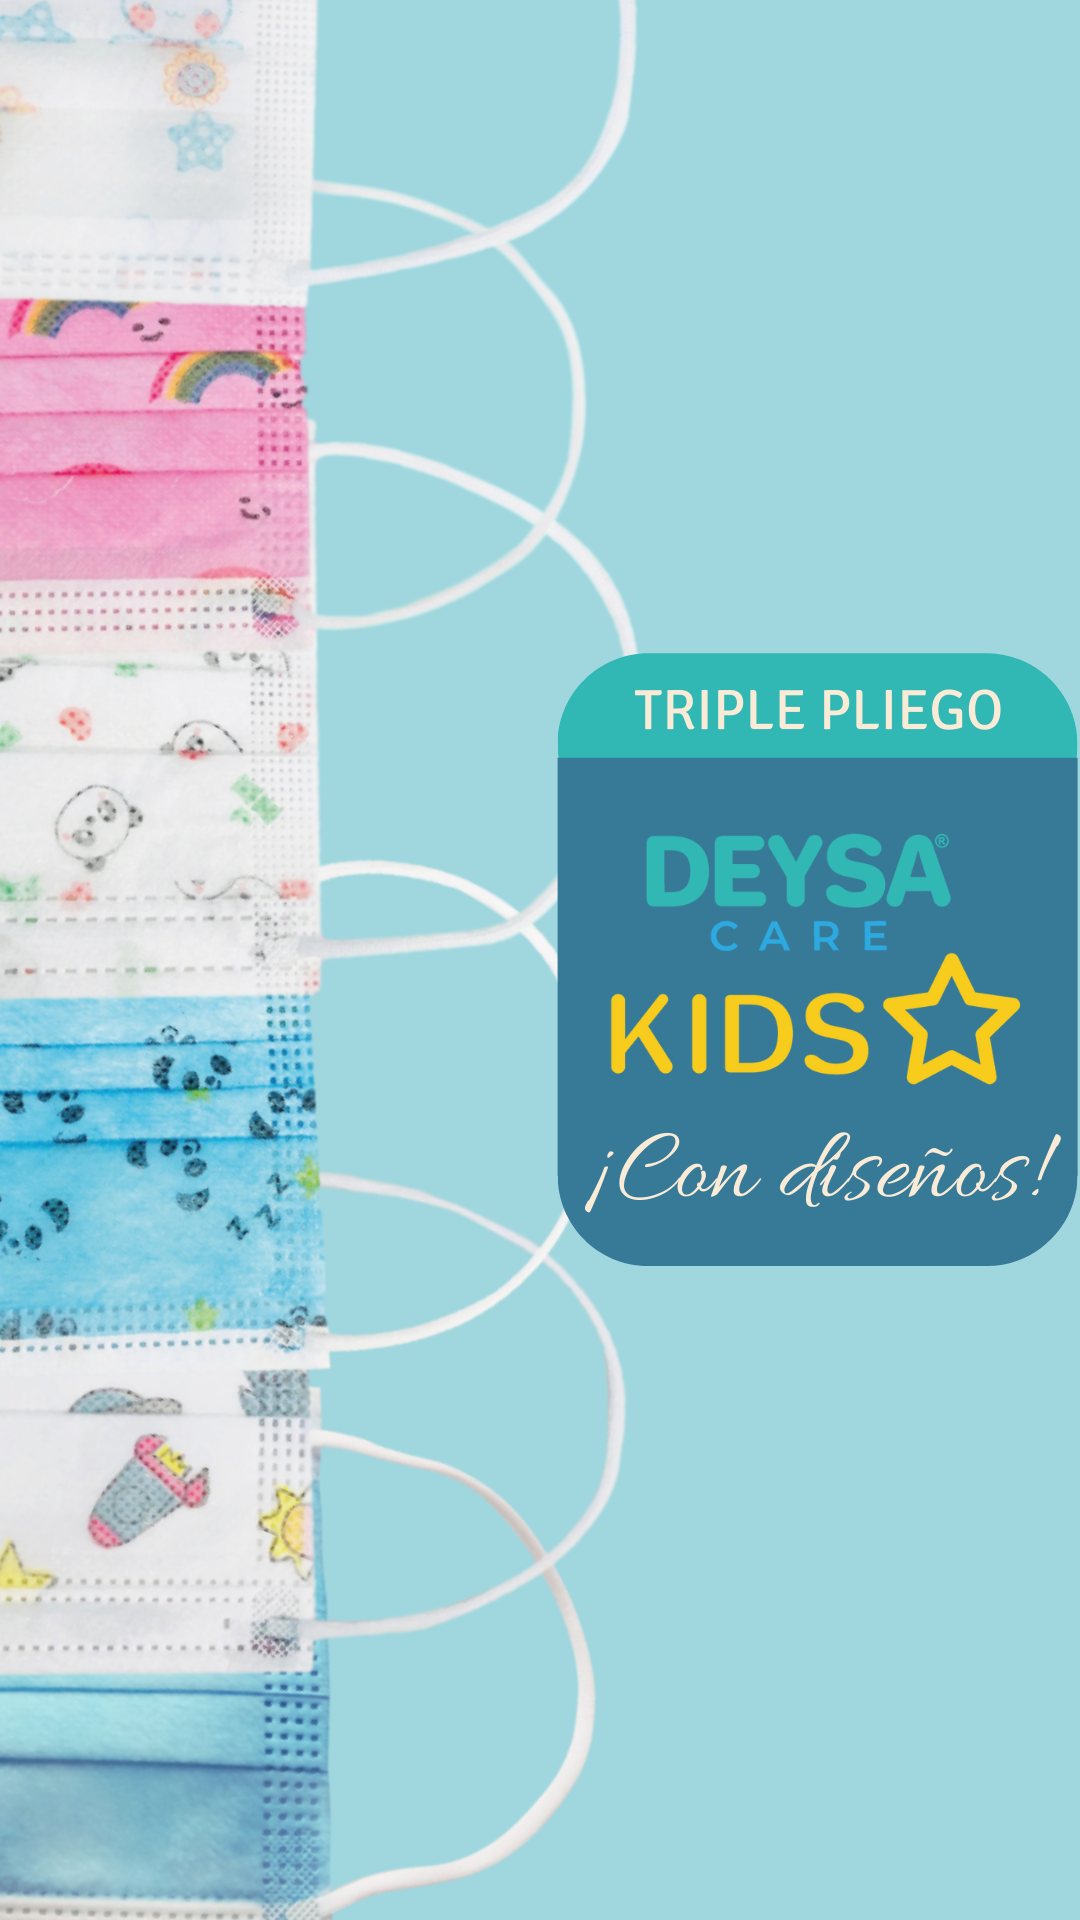 Deysa Kids